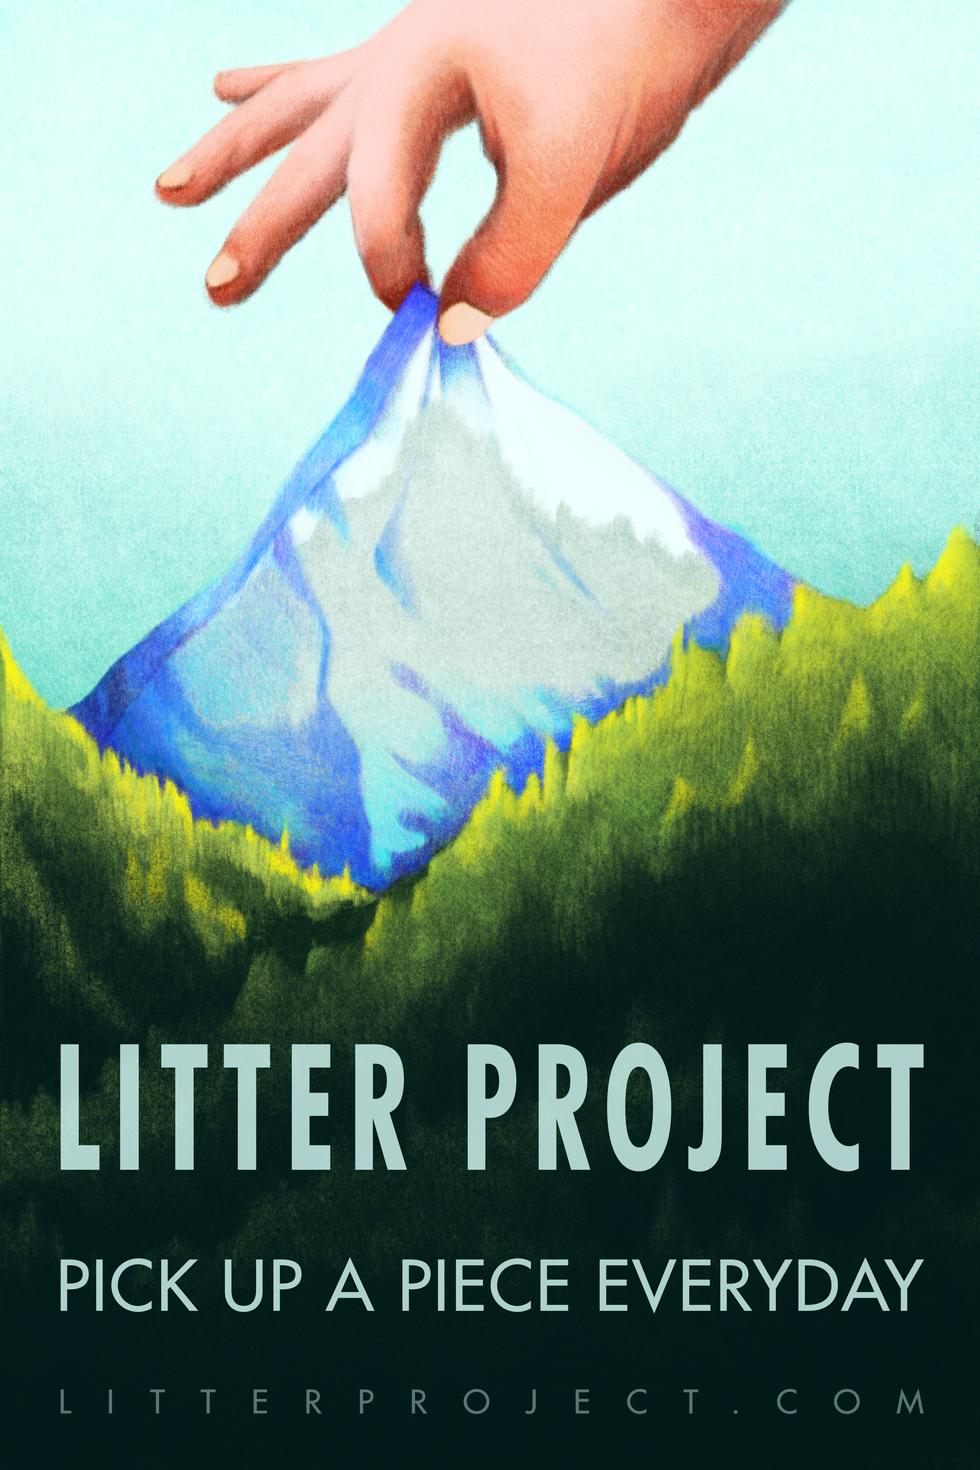 Litter Project